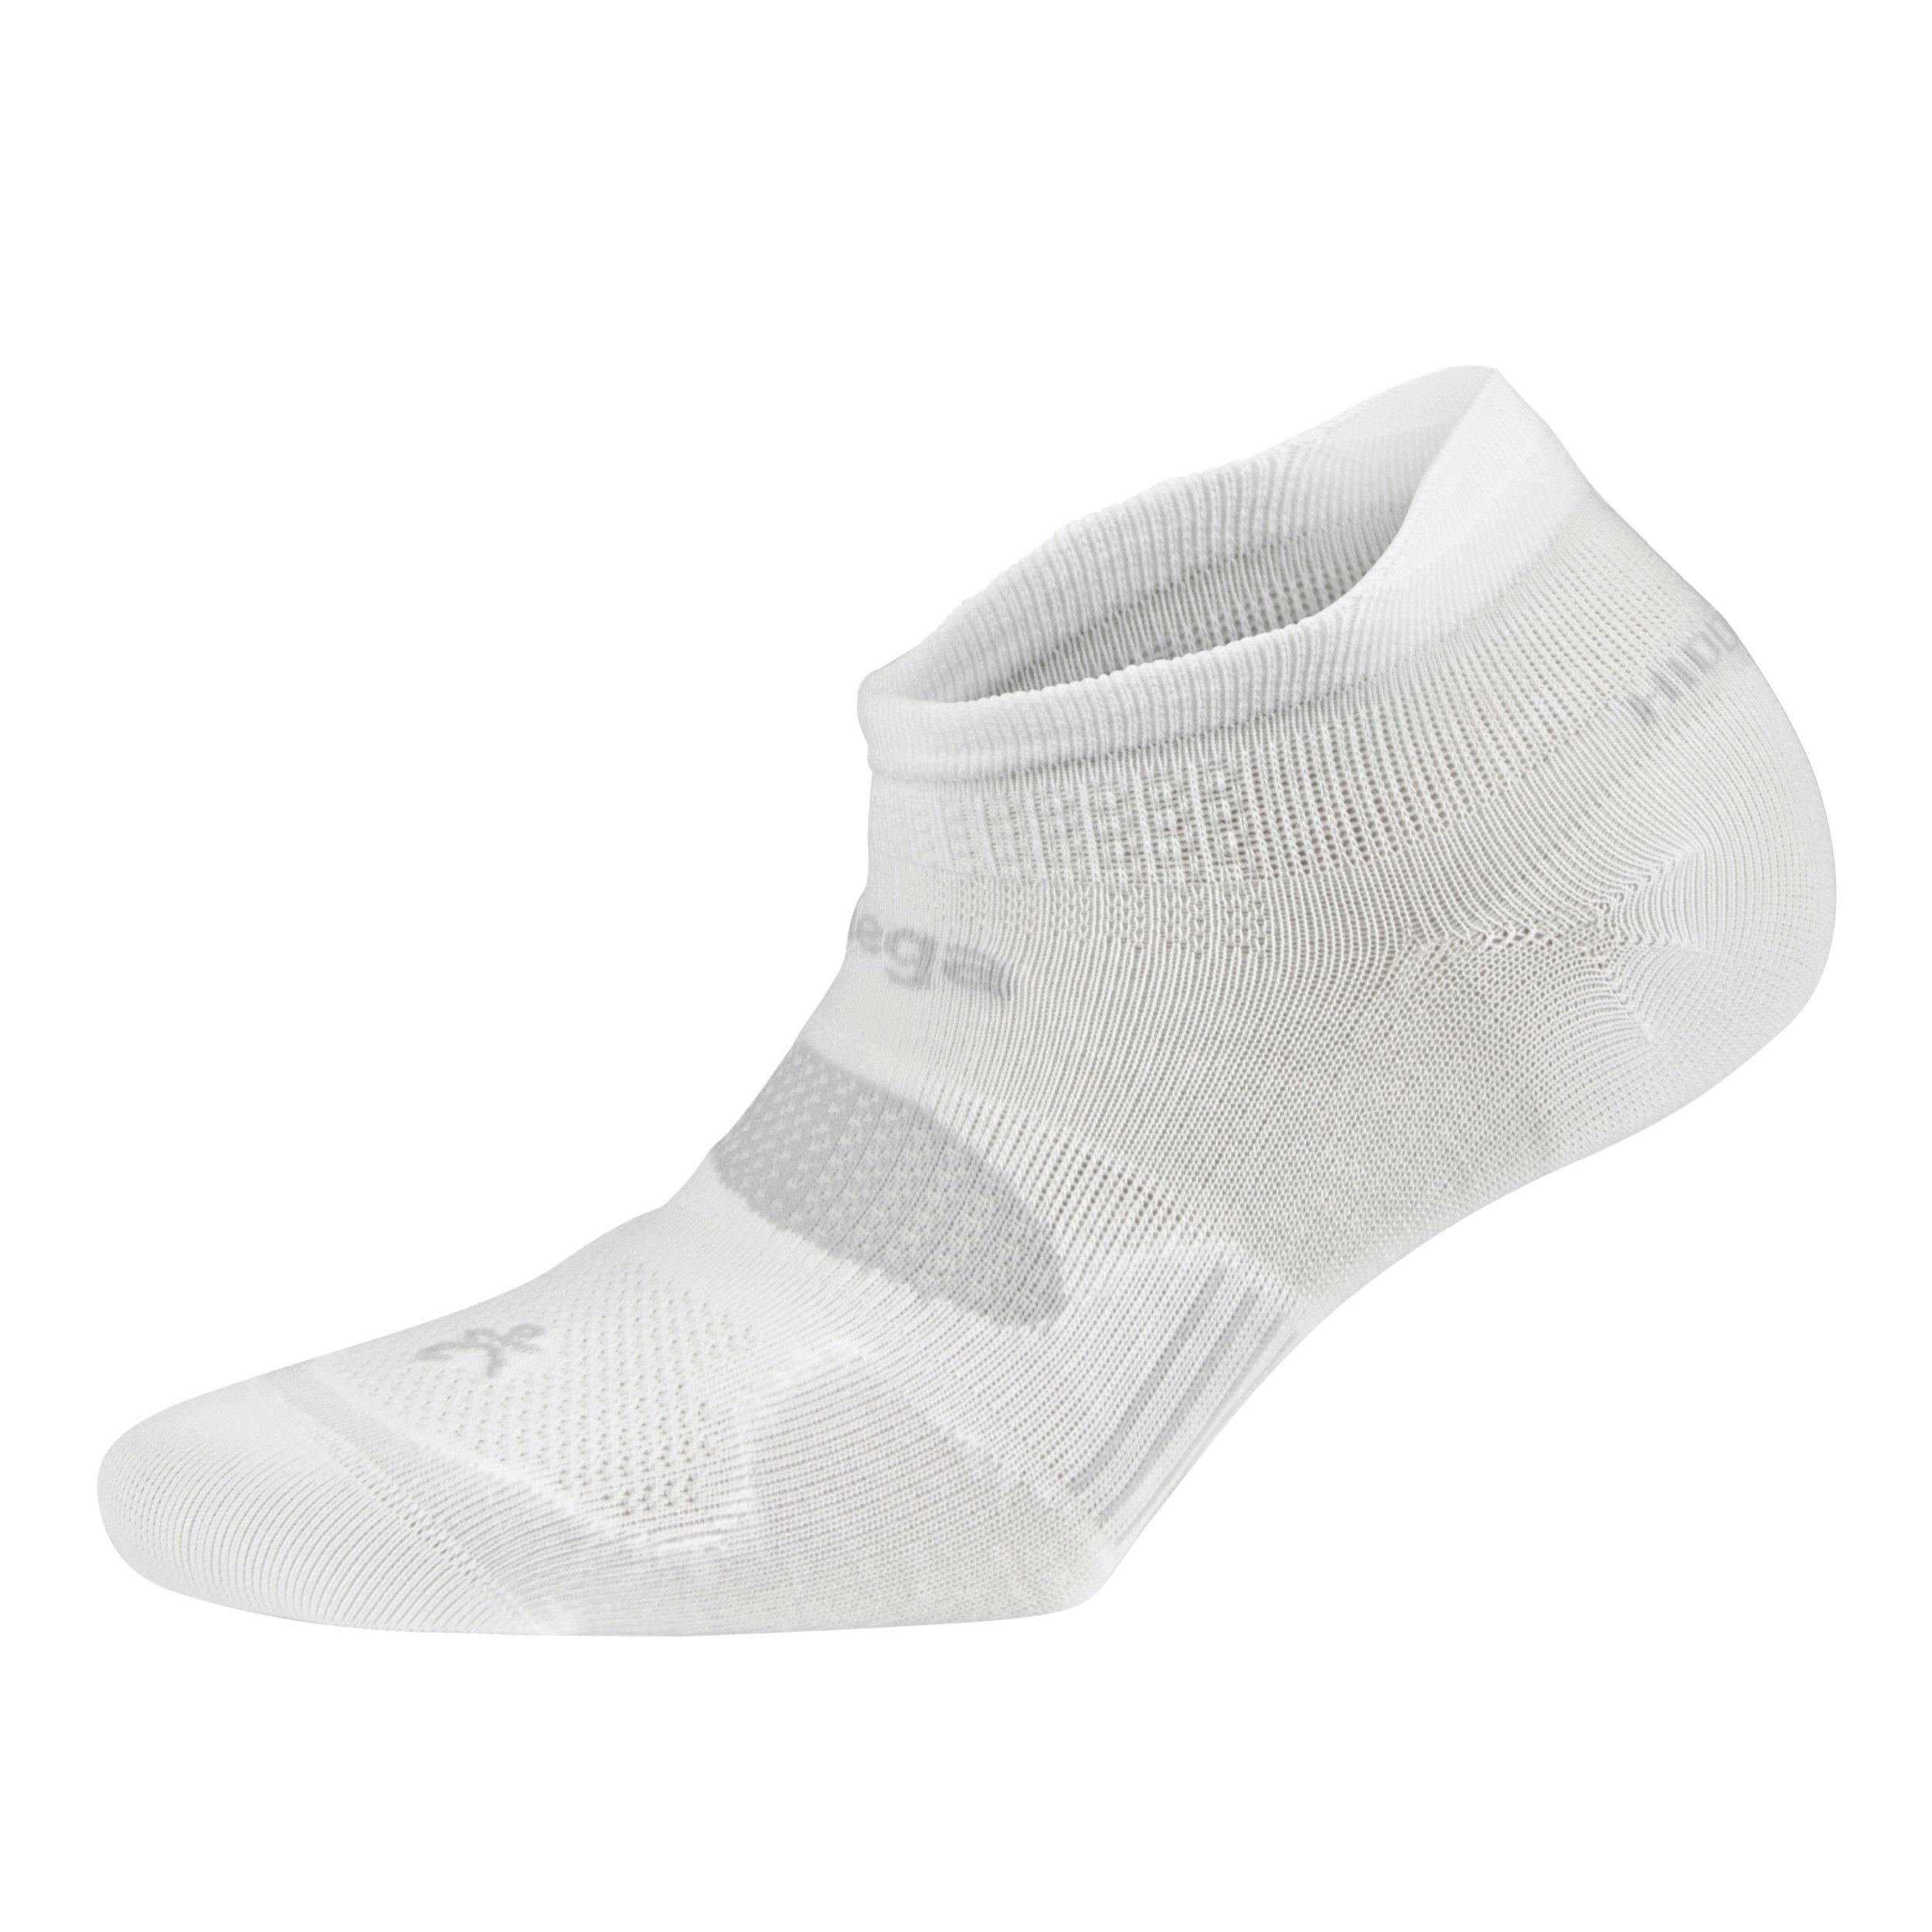 Balega Hidden Moisture Wicking Socks Medium